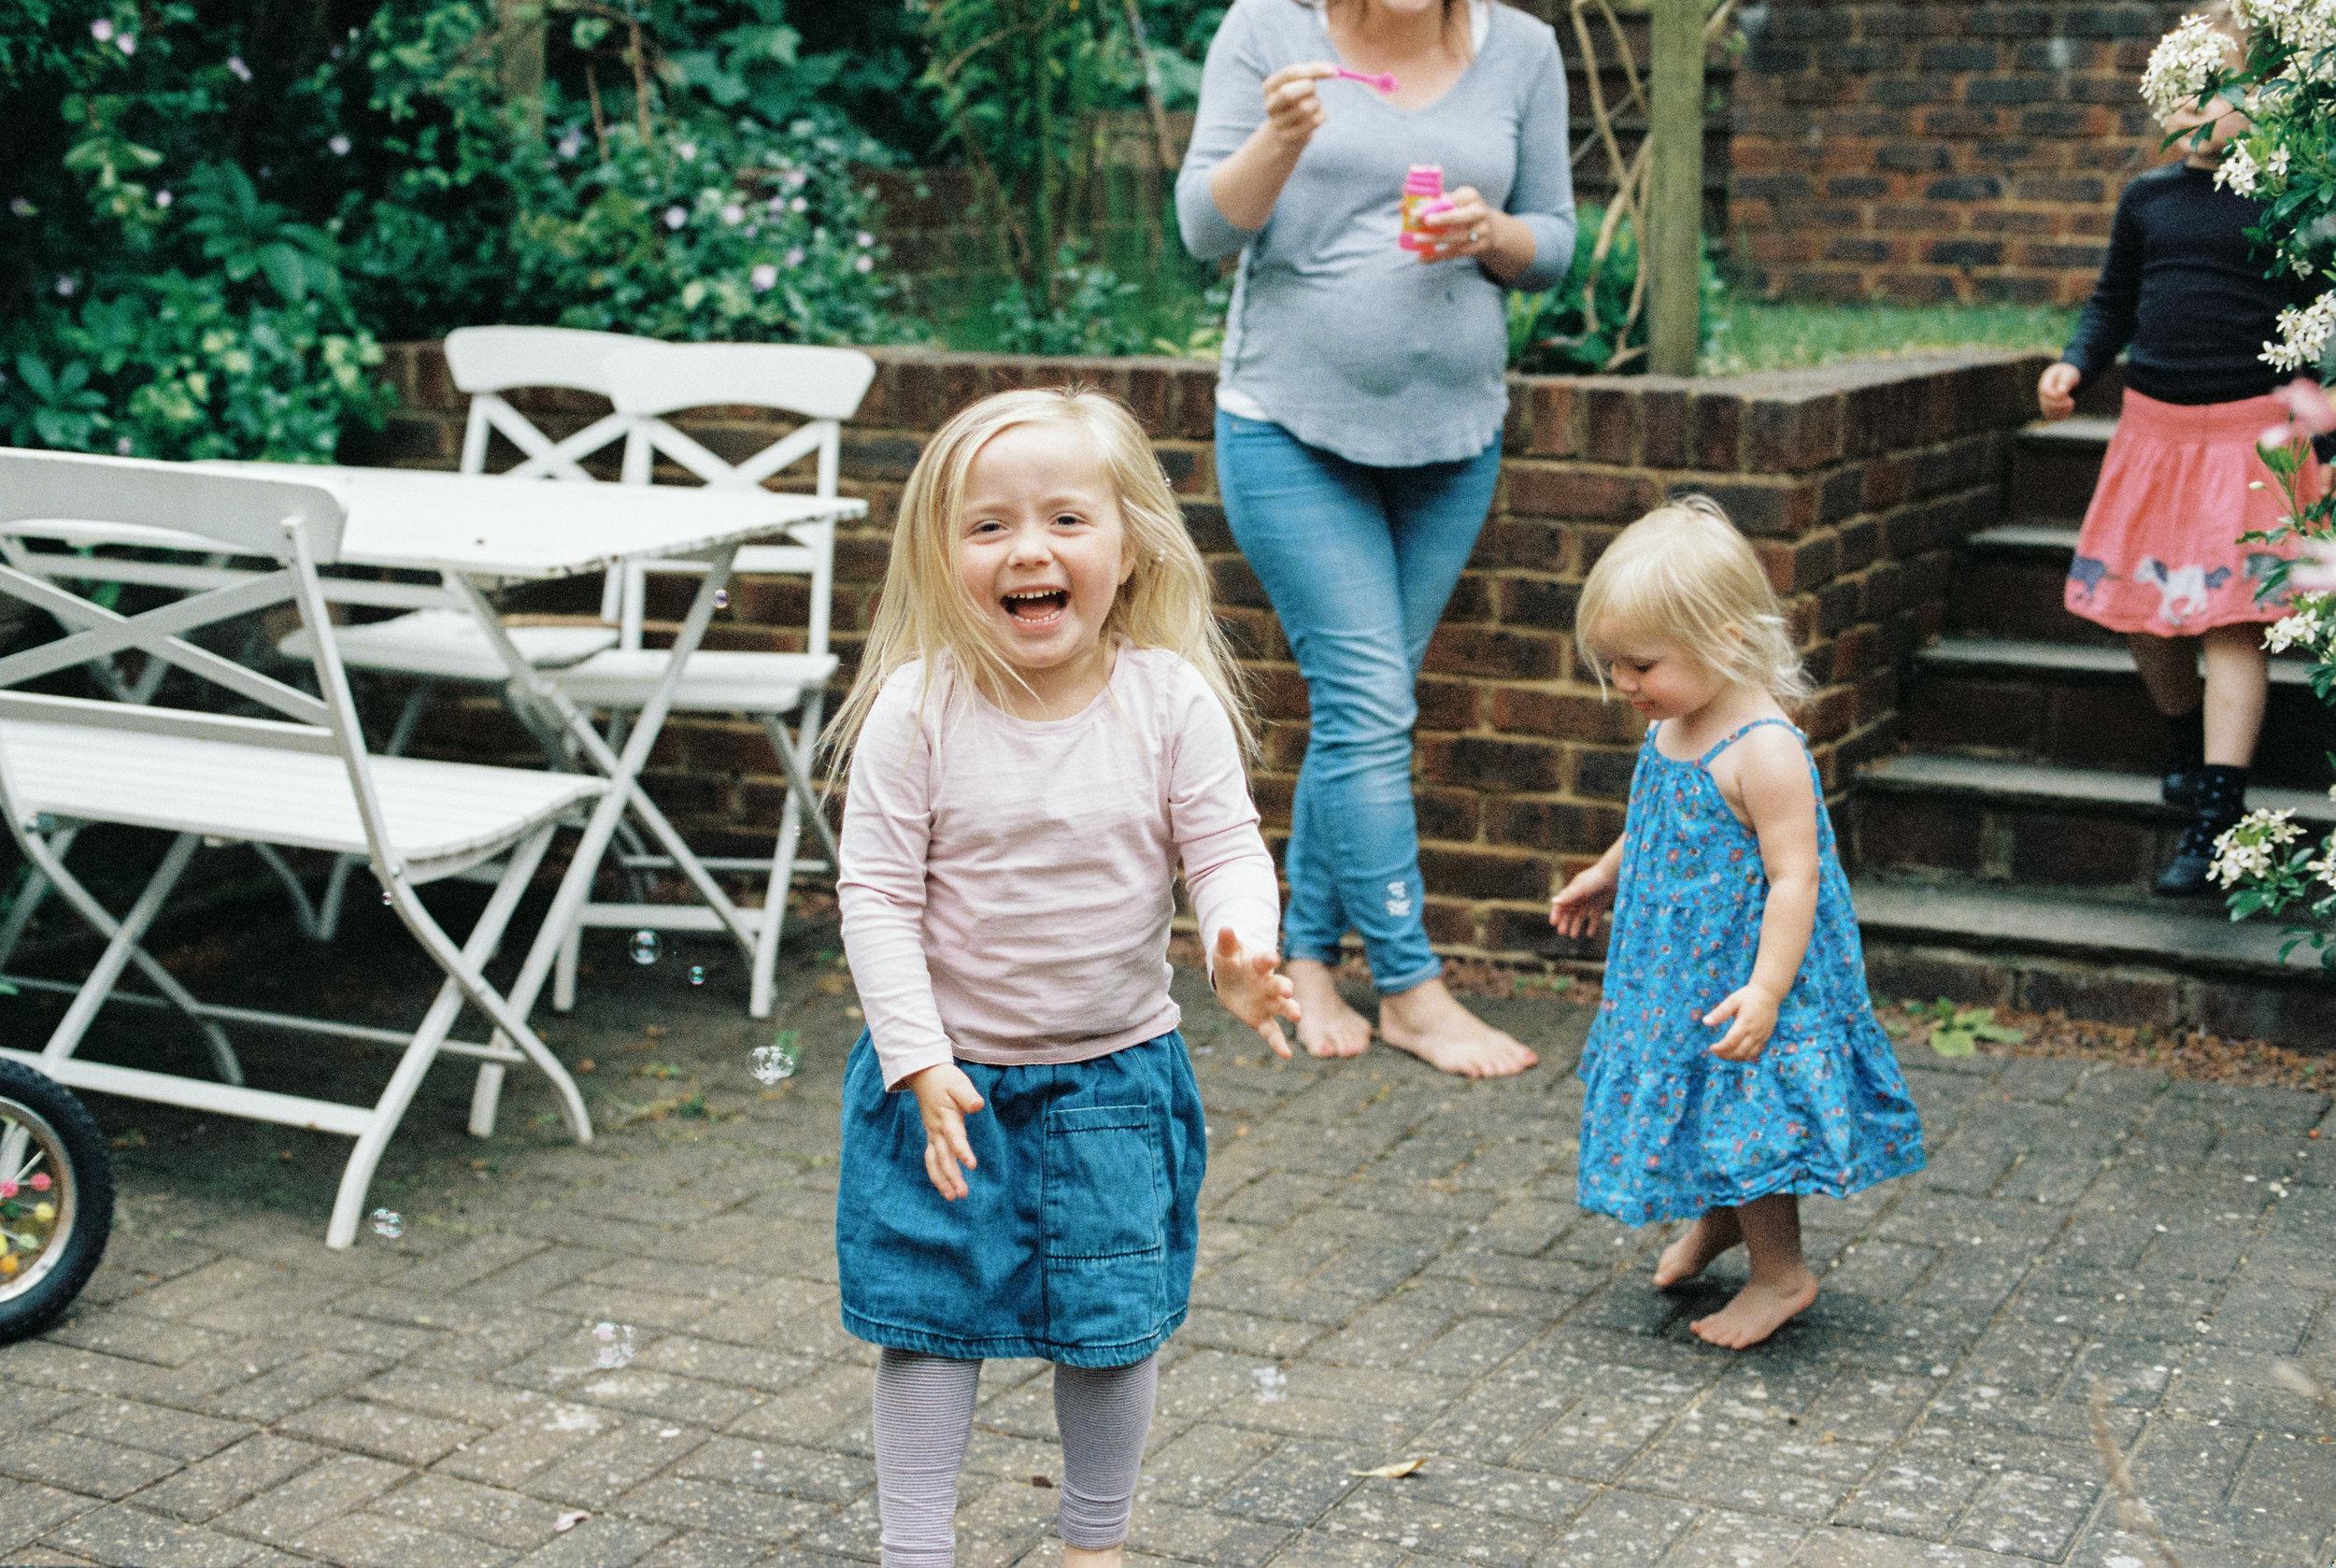 uk-film-photographer-london-family-natural-photography-107.jpg